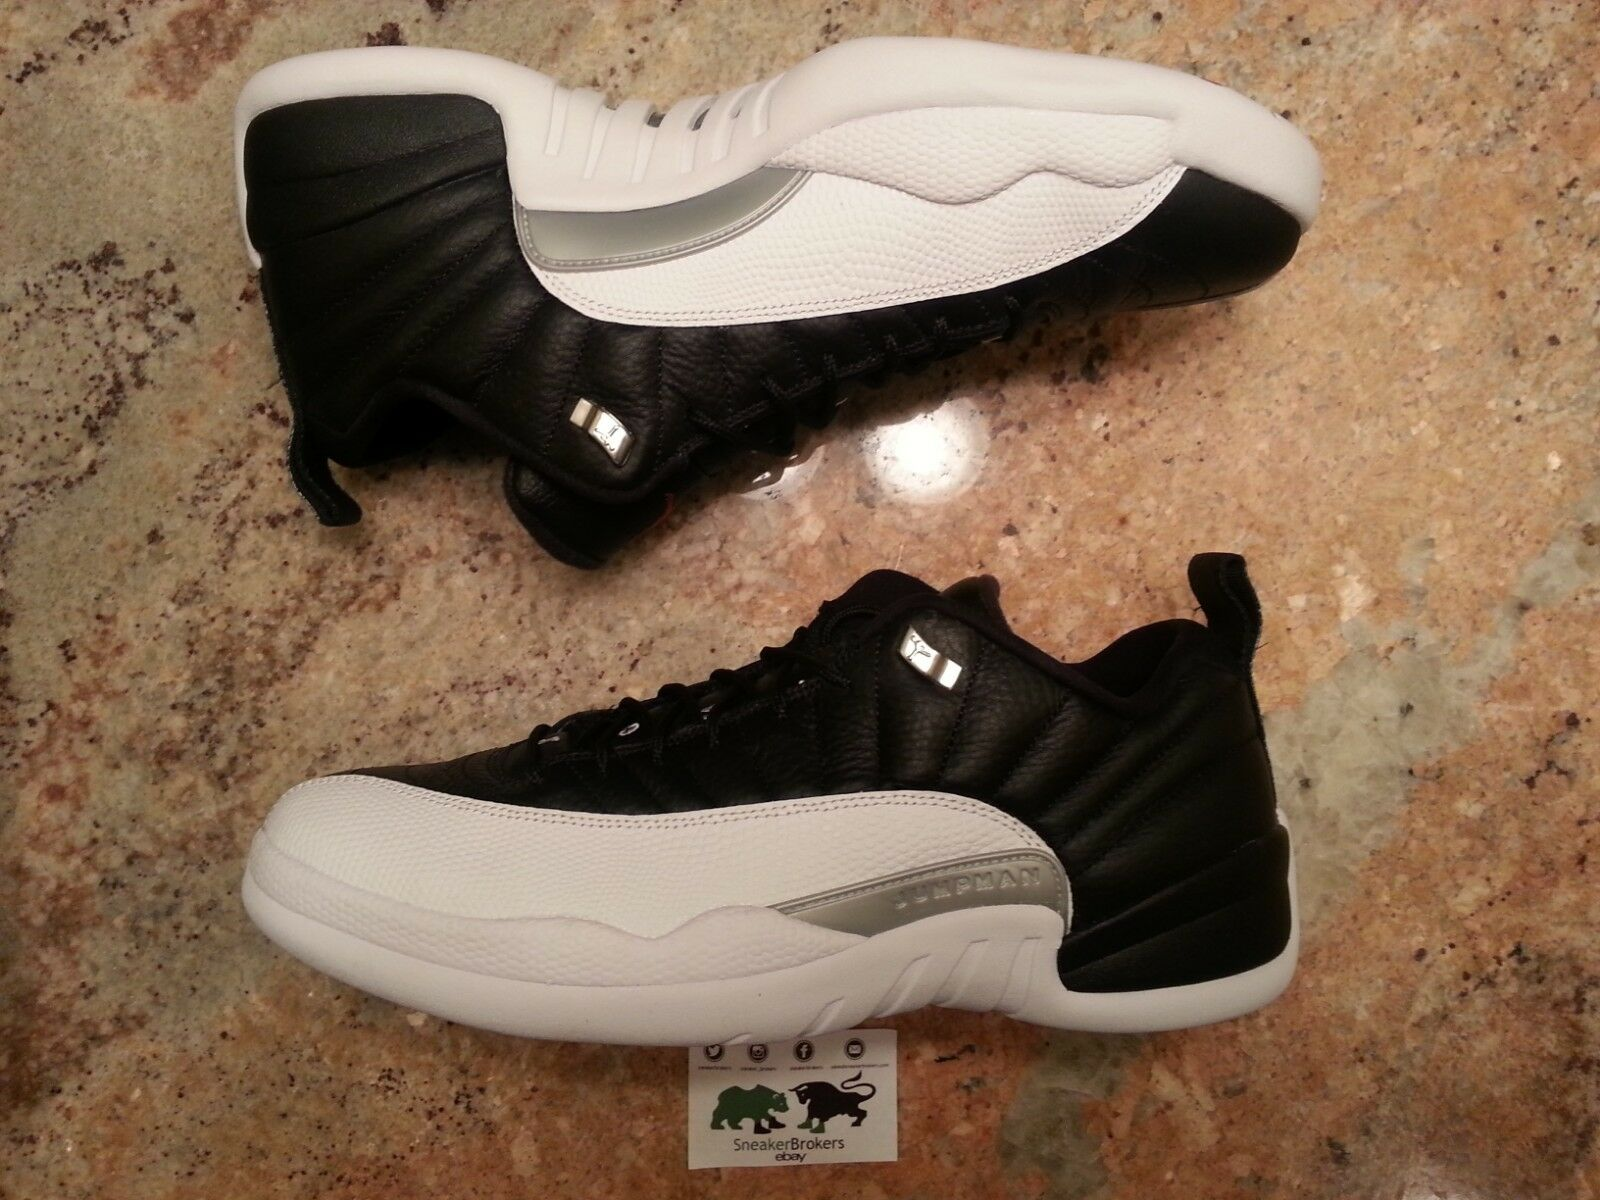 2017 Nike Air Jordan 12 XII Retro Low Playoff Size 13. 308317-004.